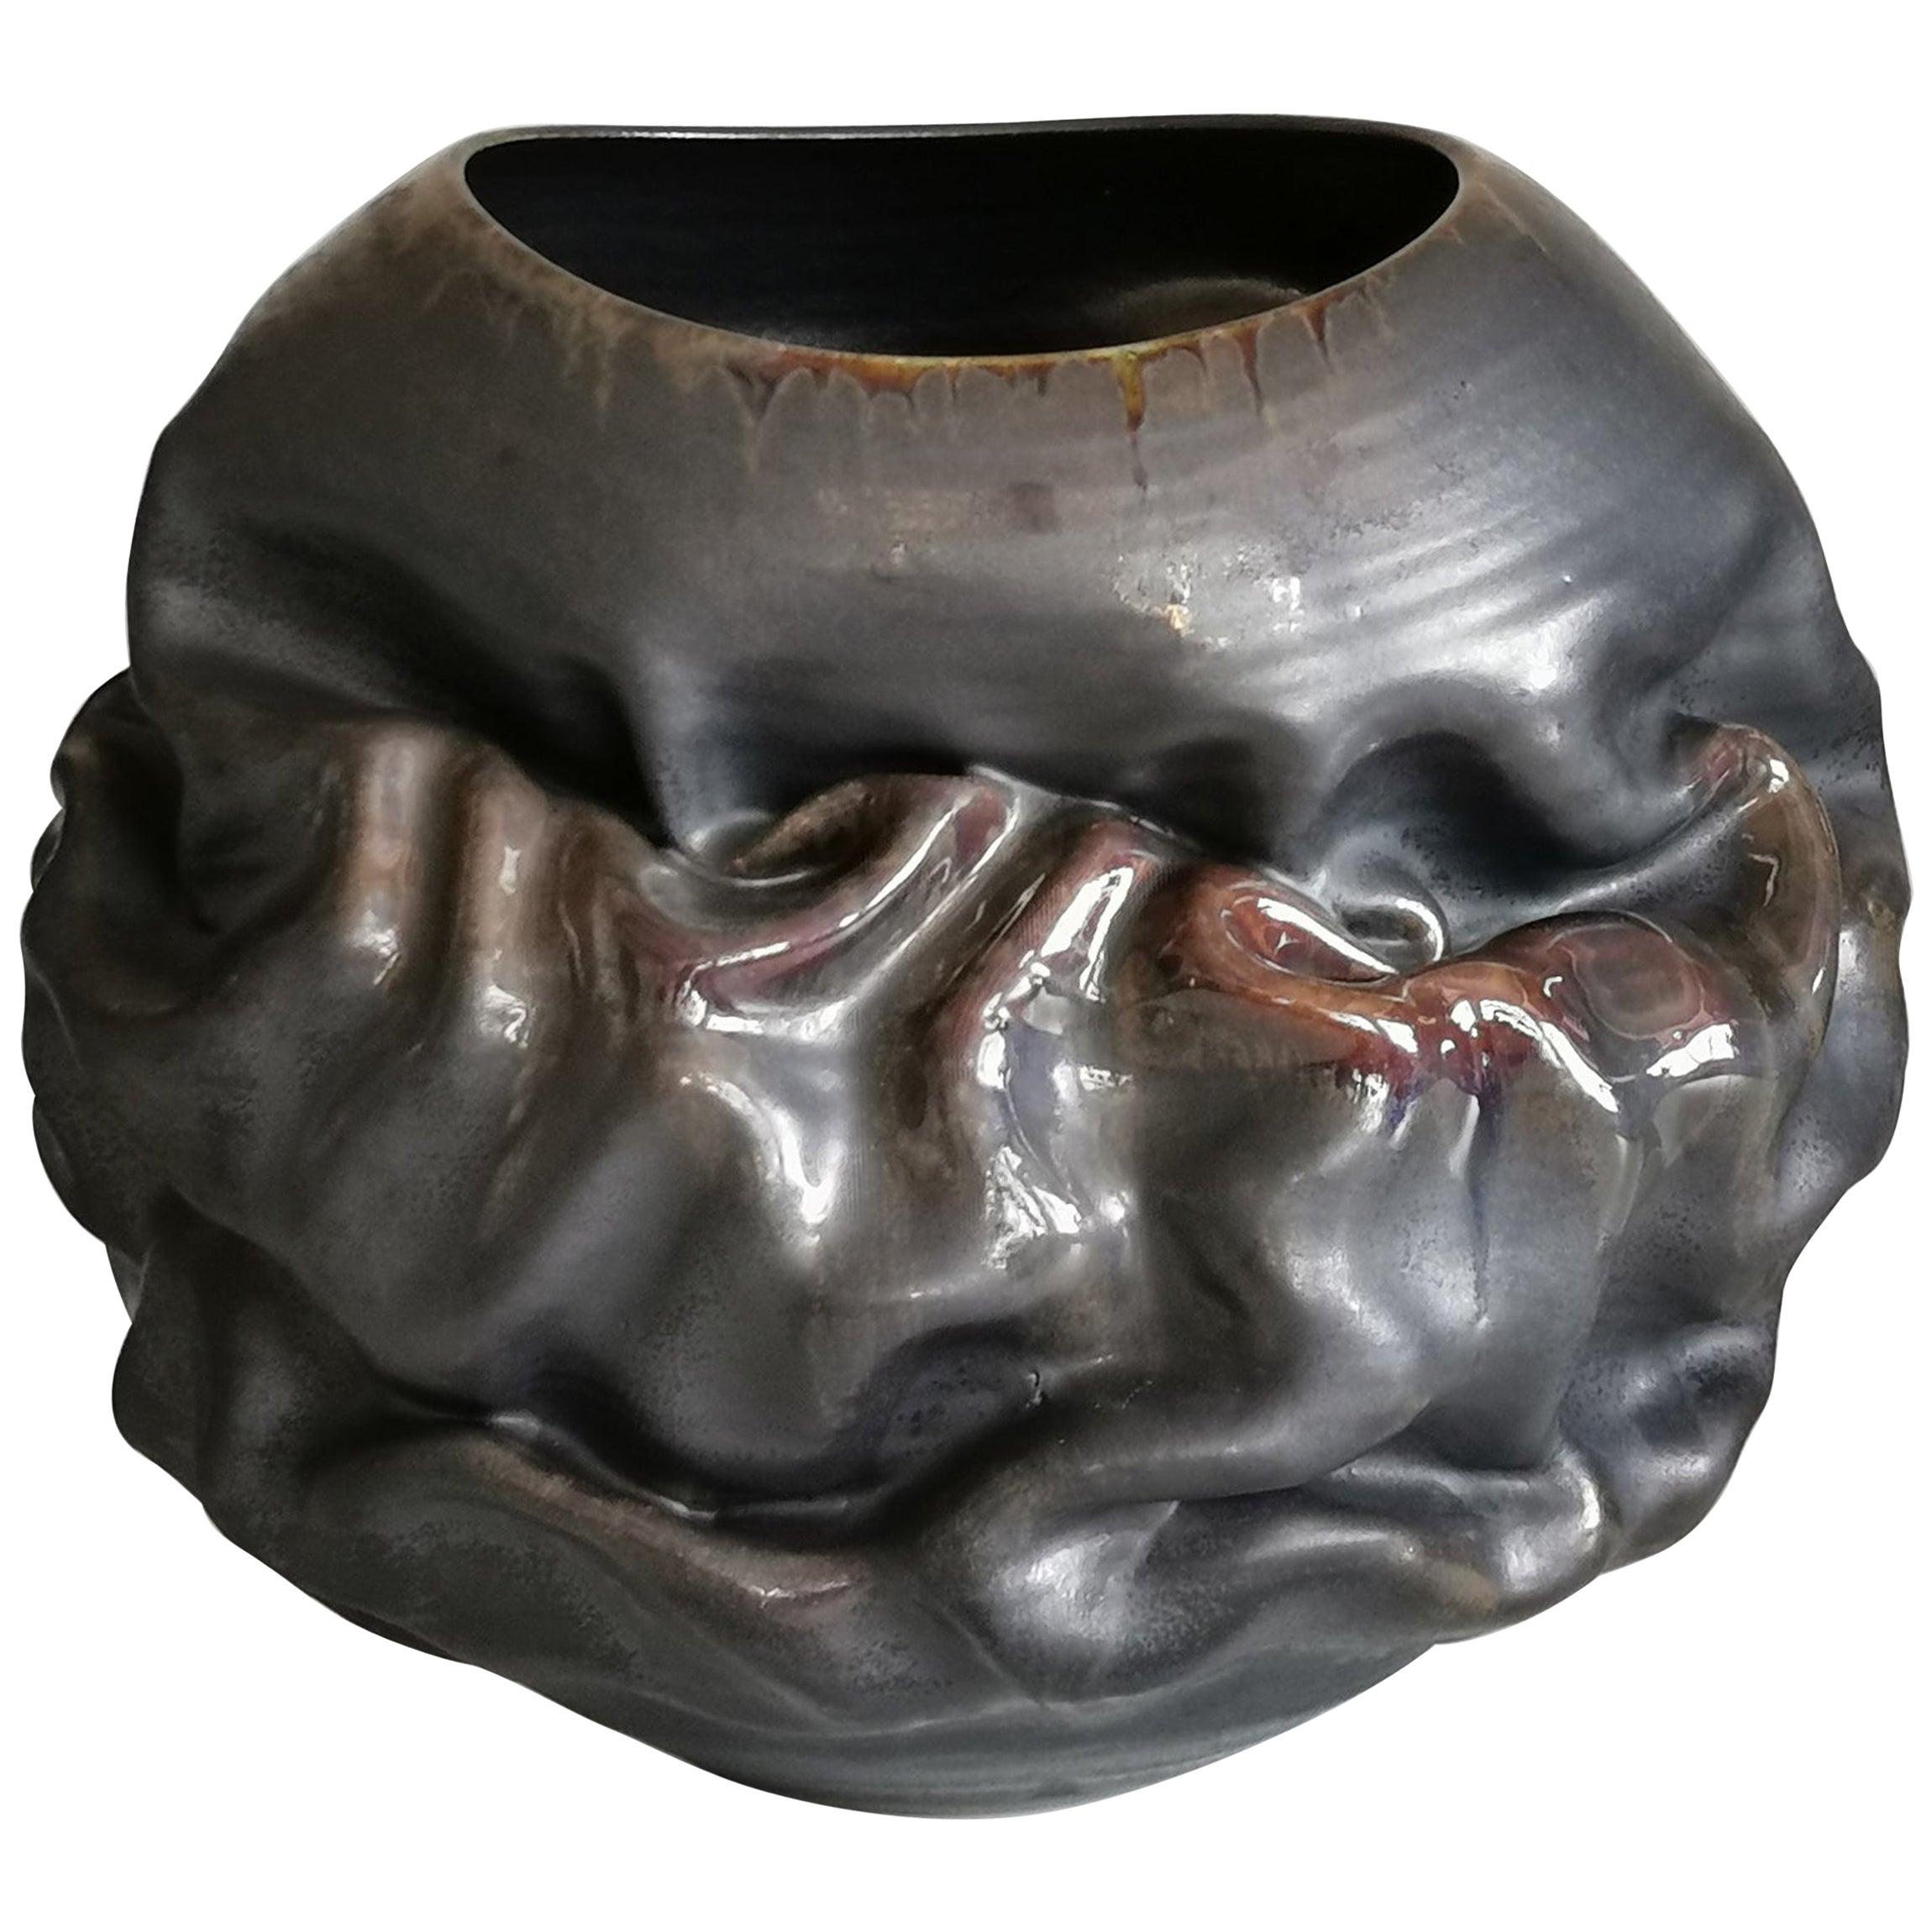 Black Metallic Oval Dehydrated Form, Vase, Interior Sculpture or Vessel, Objet D